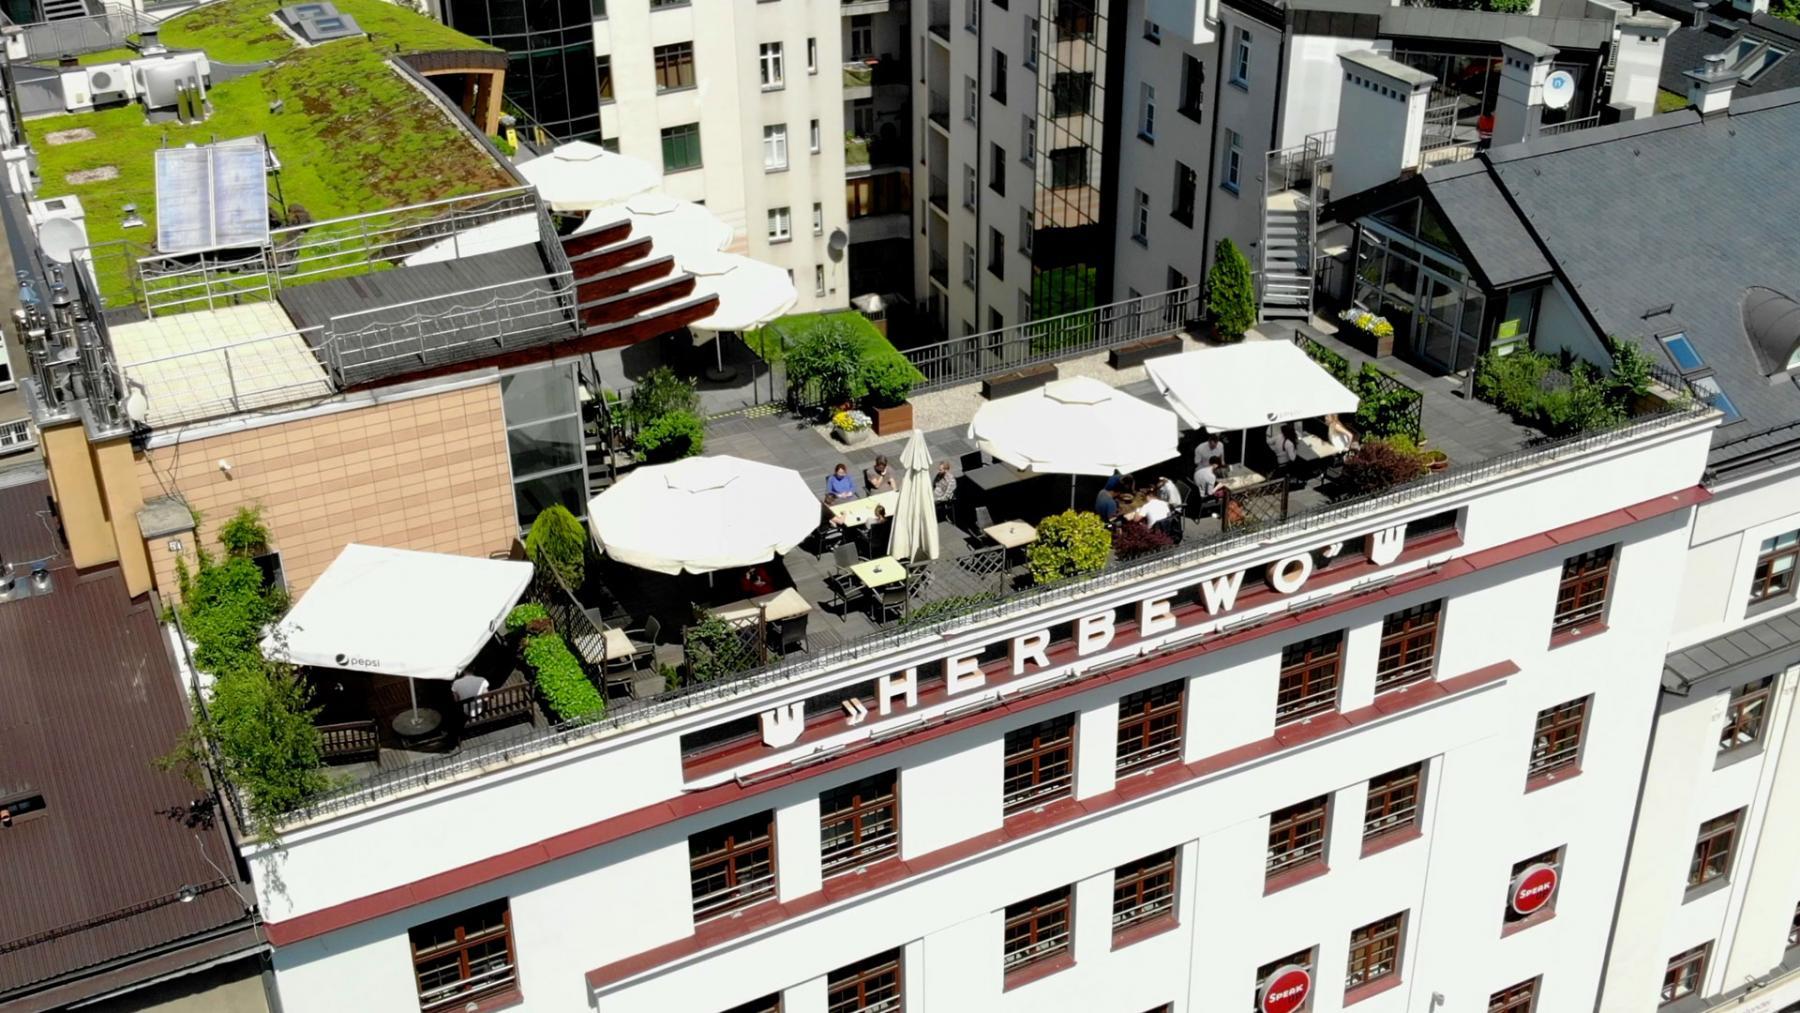 terrace aleja slowackiego cracow